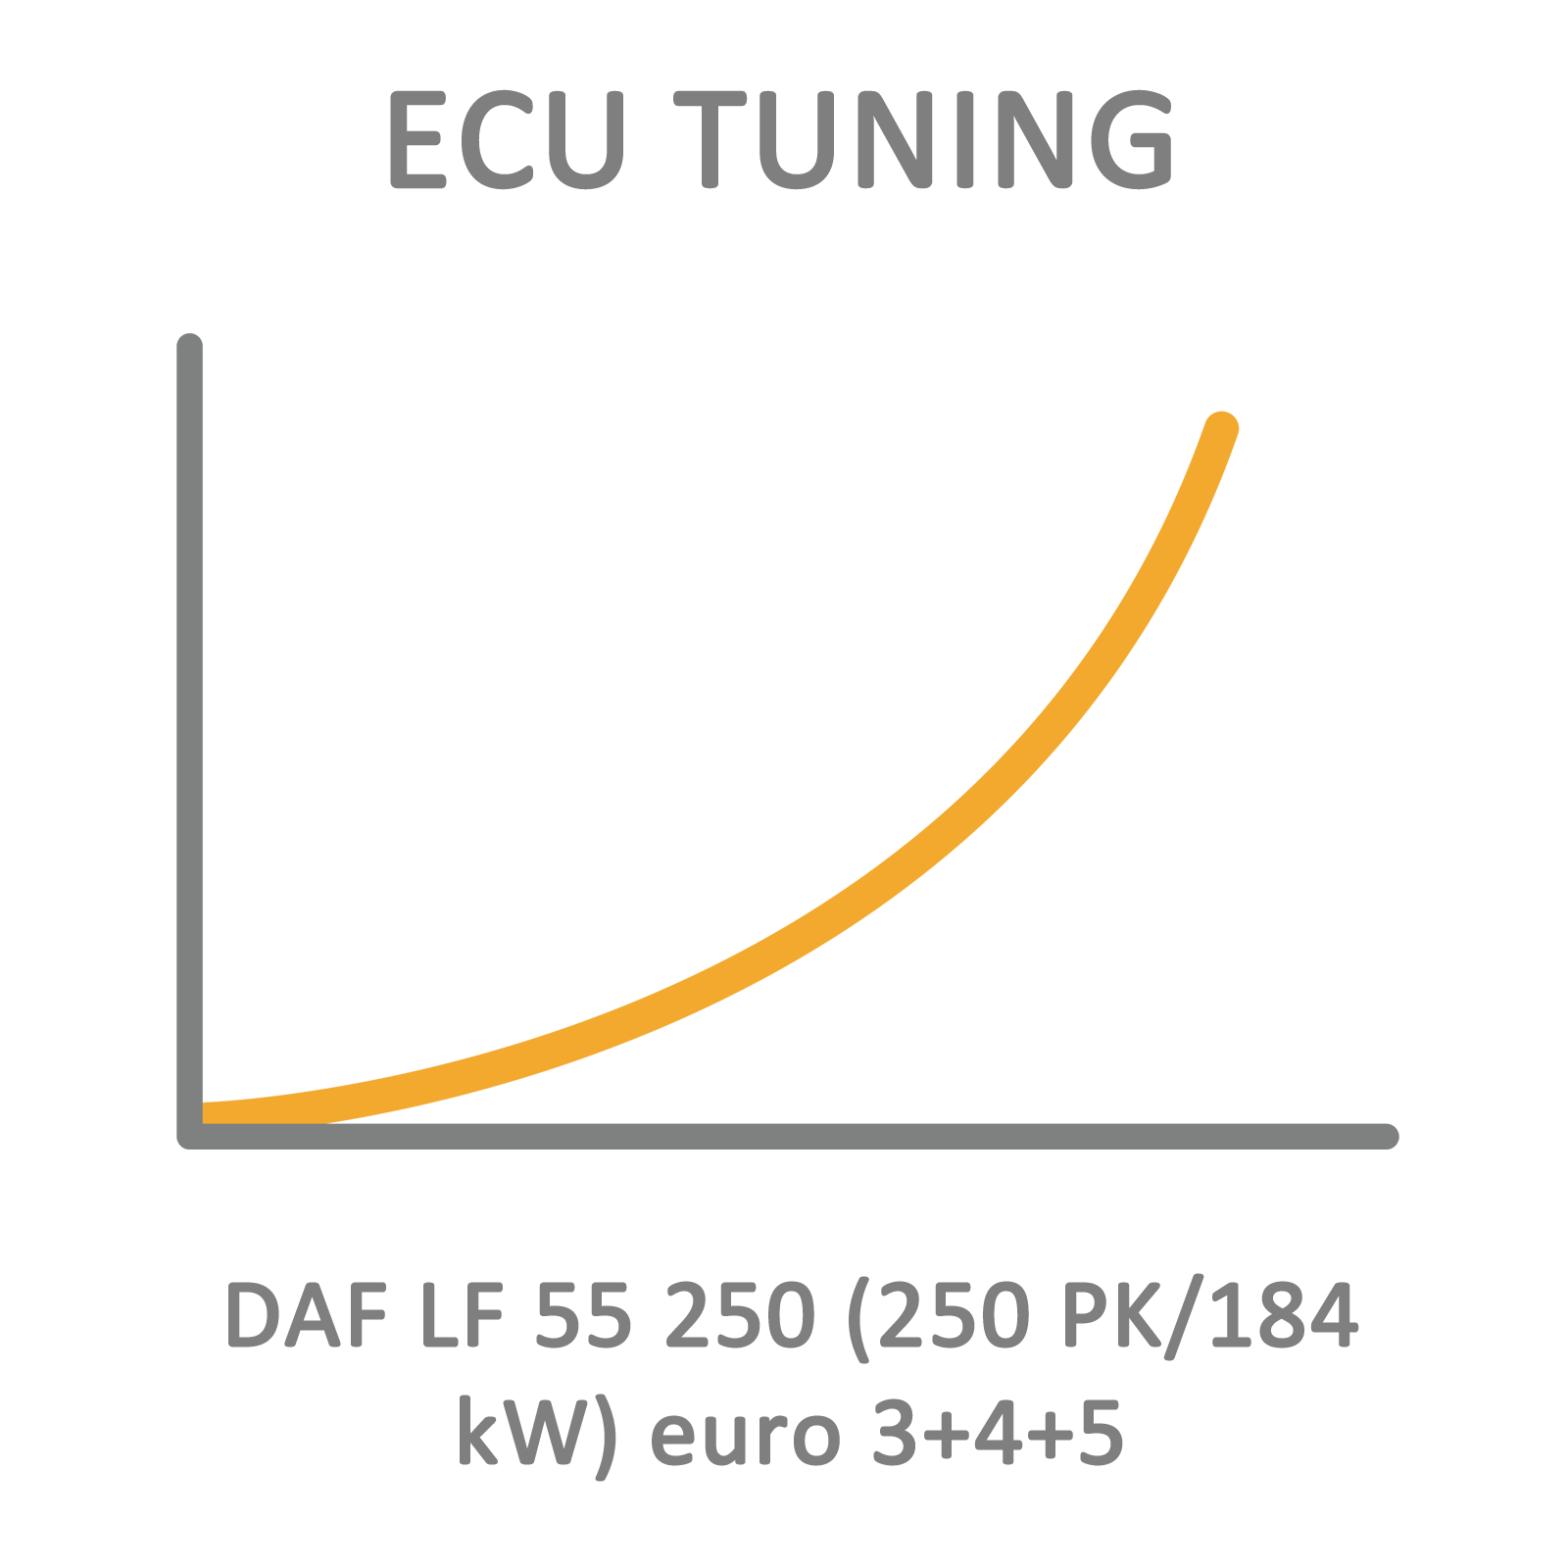 DAF LF 55 250 (250 PK/184 kW) euro 3+4+5 ECU Tuning